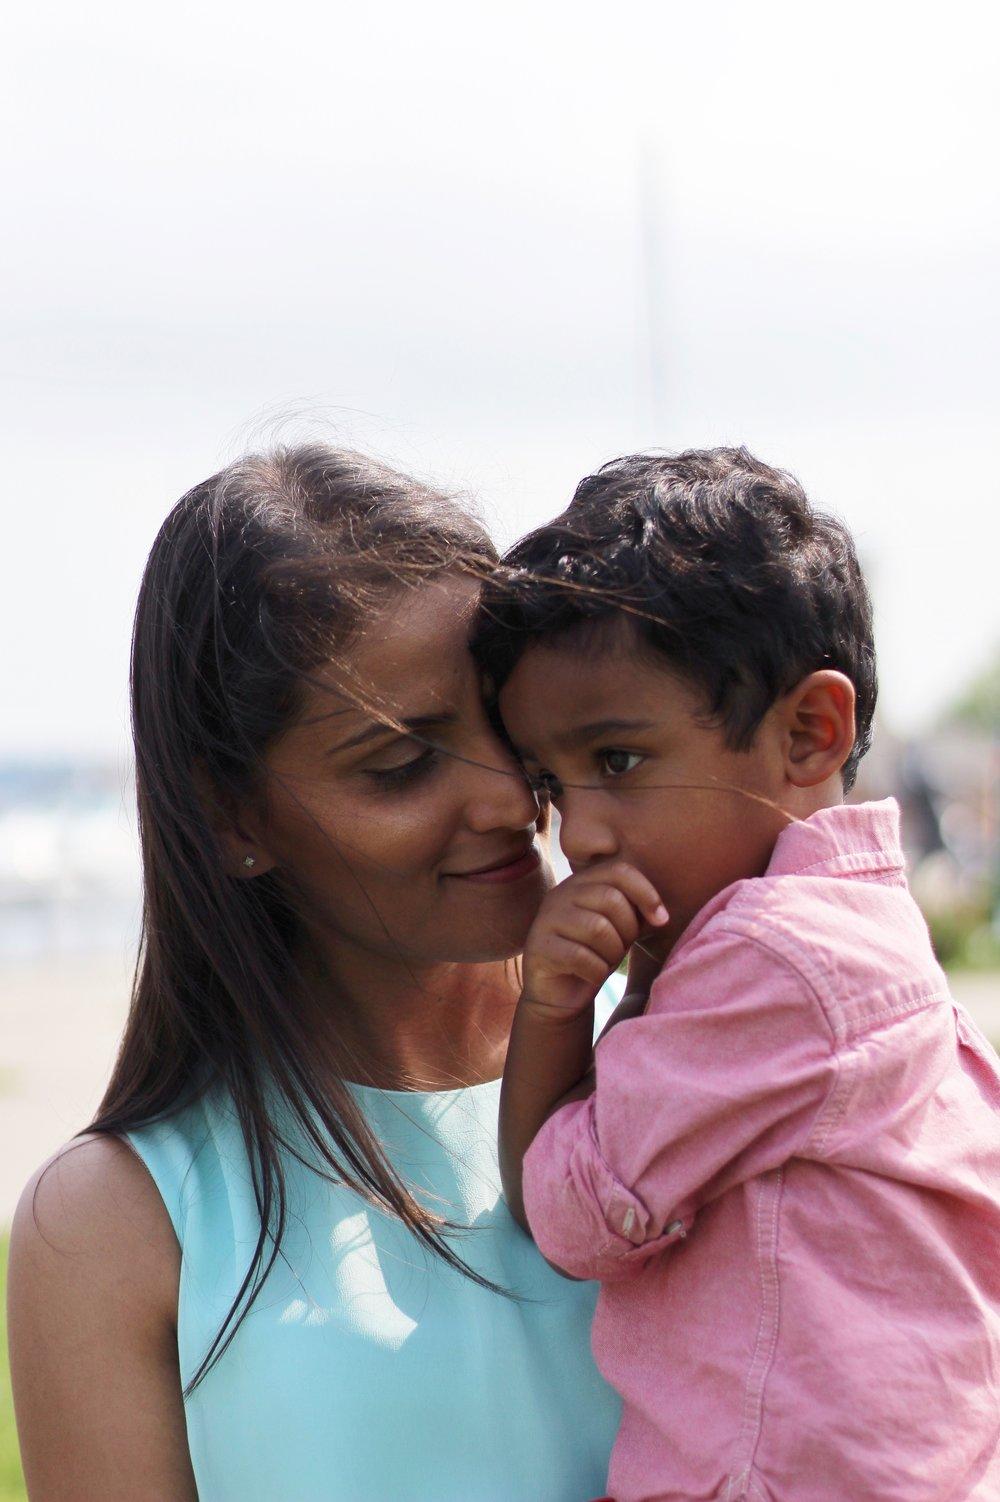 Patel Family Traverse City August 2018 (59).JPG